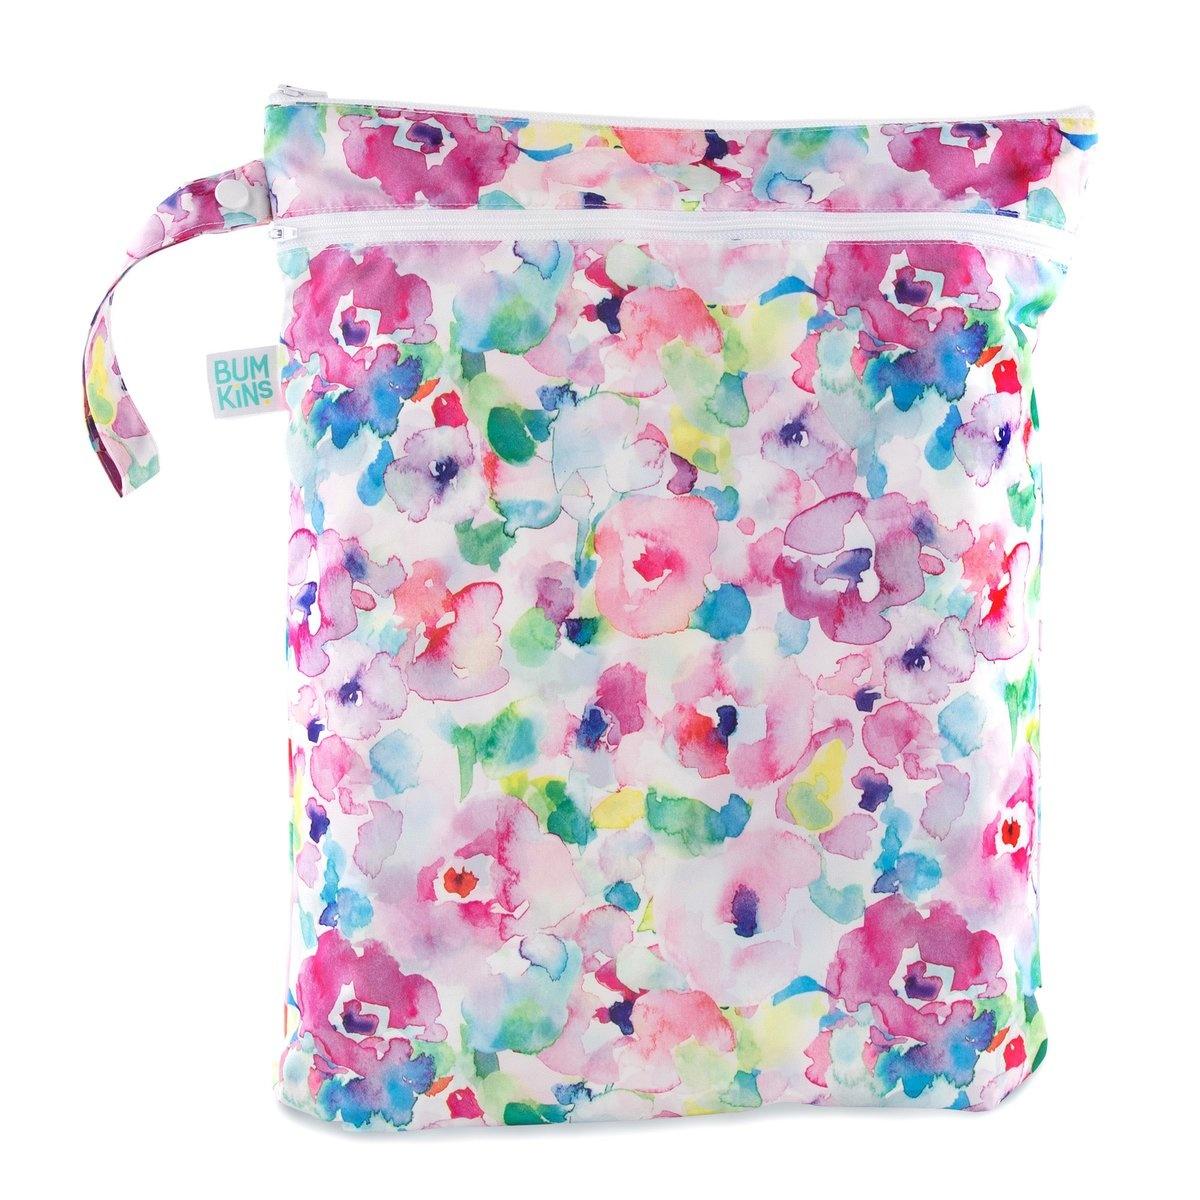 Bumkins Wet Bag Watercolor Flower